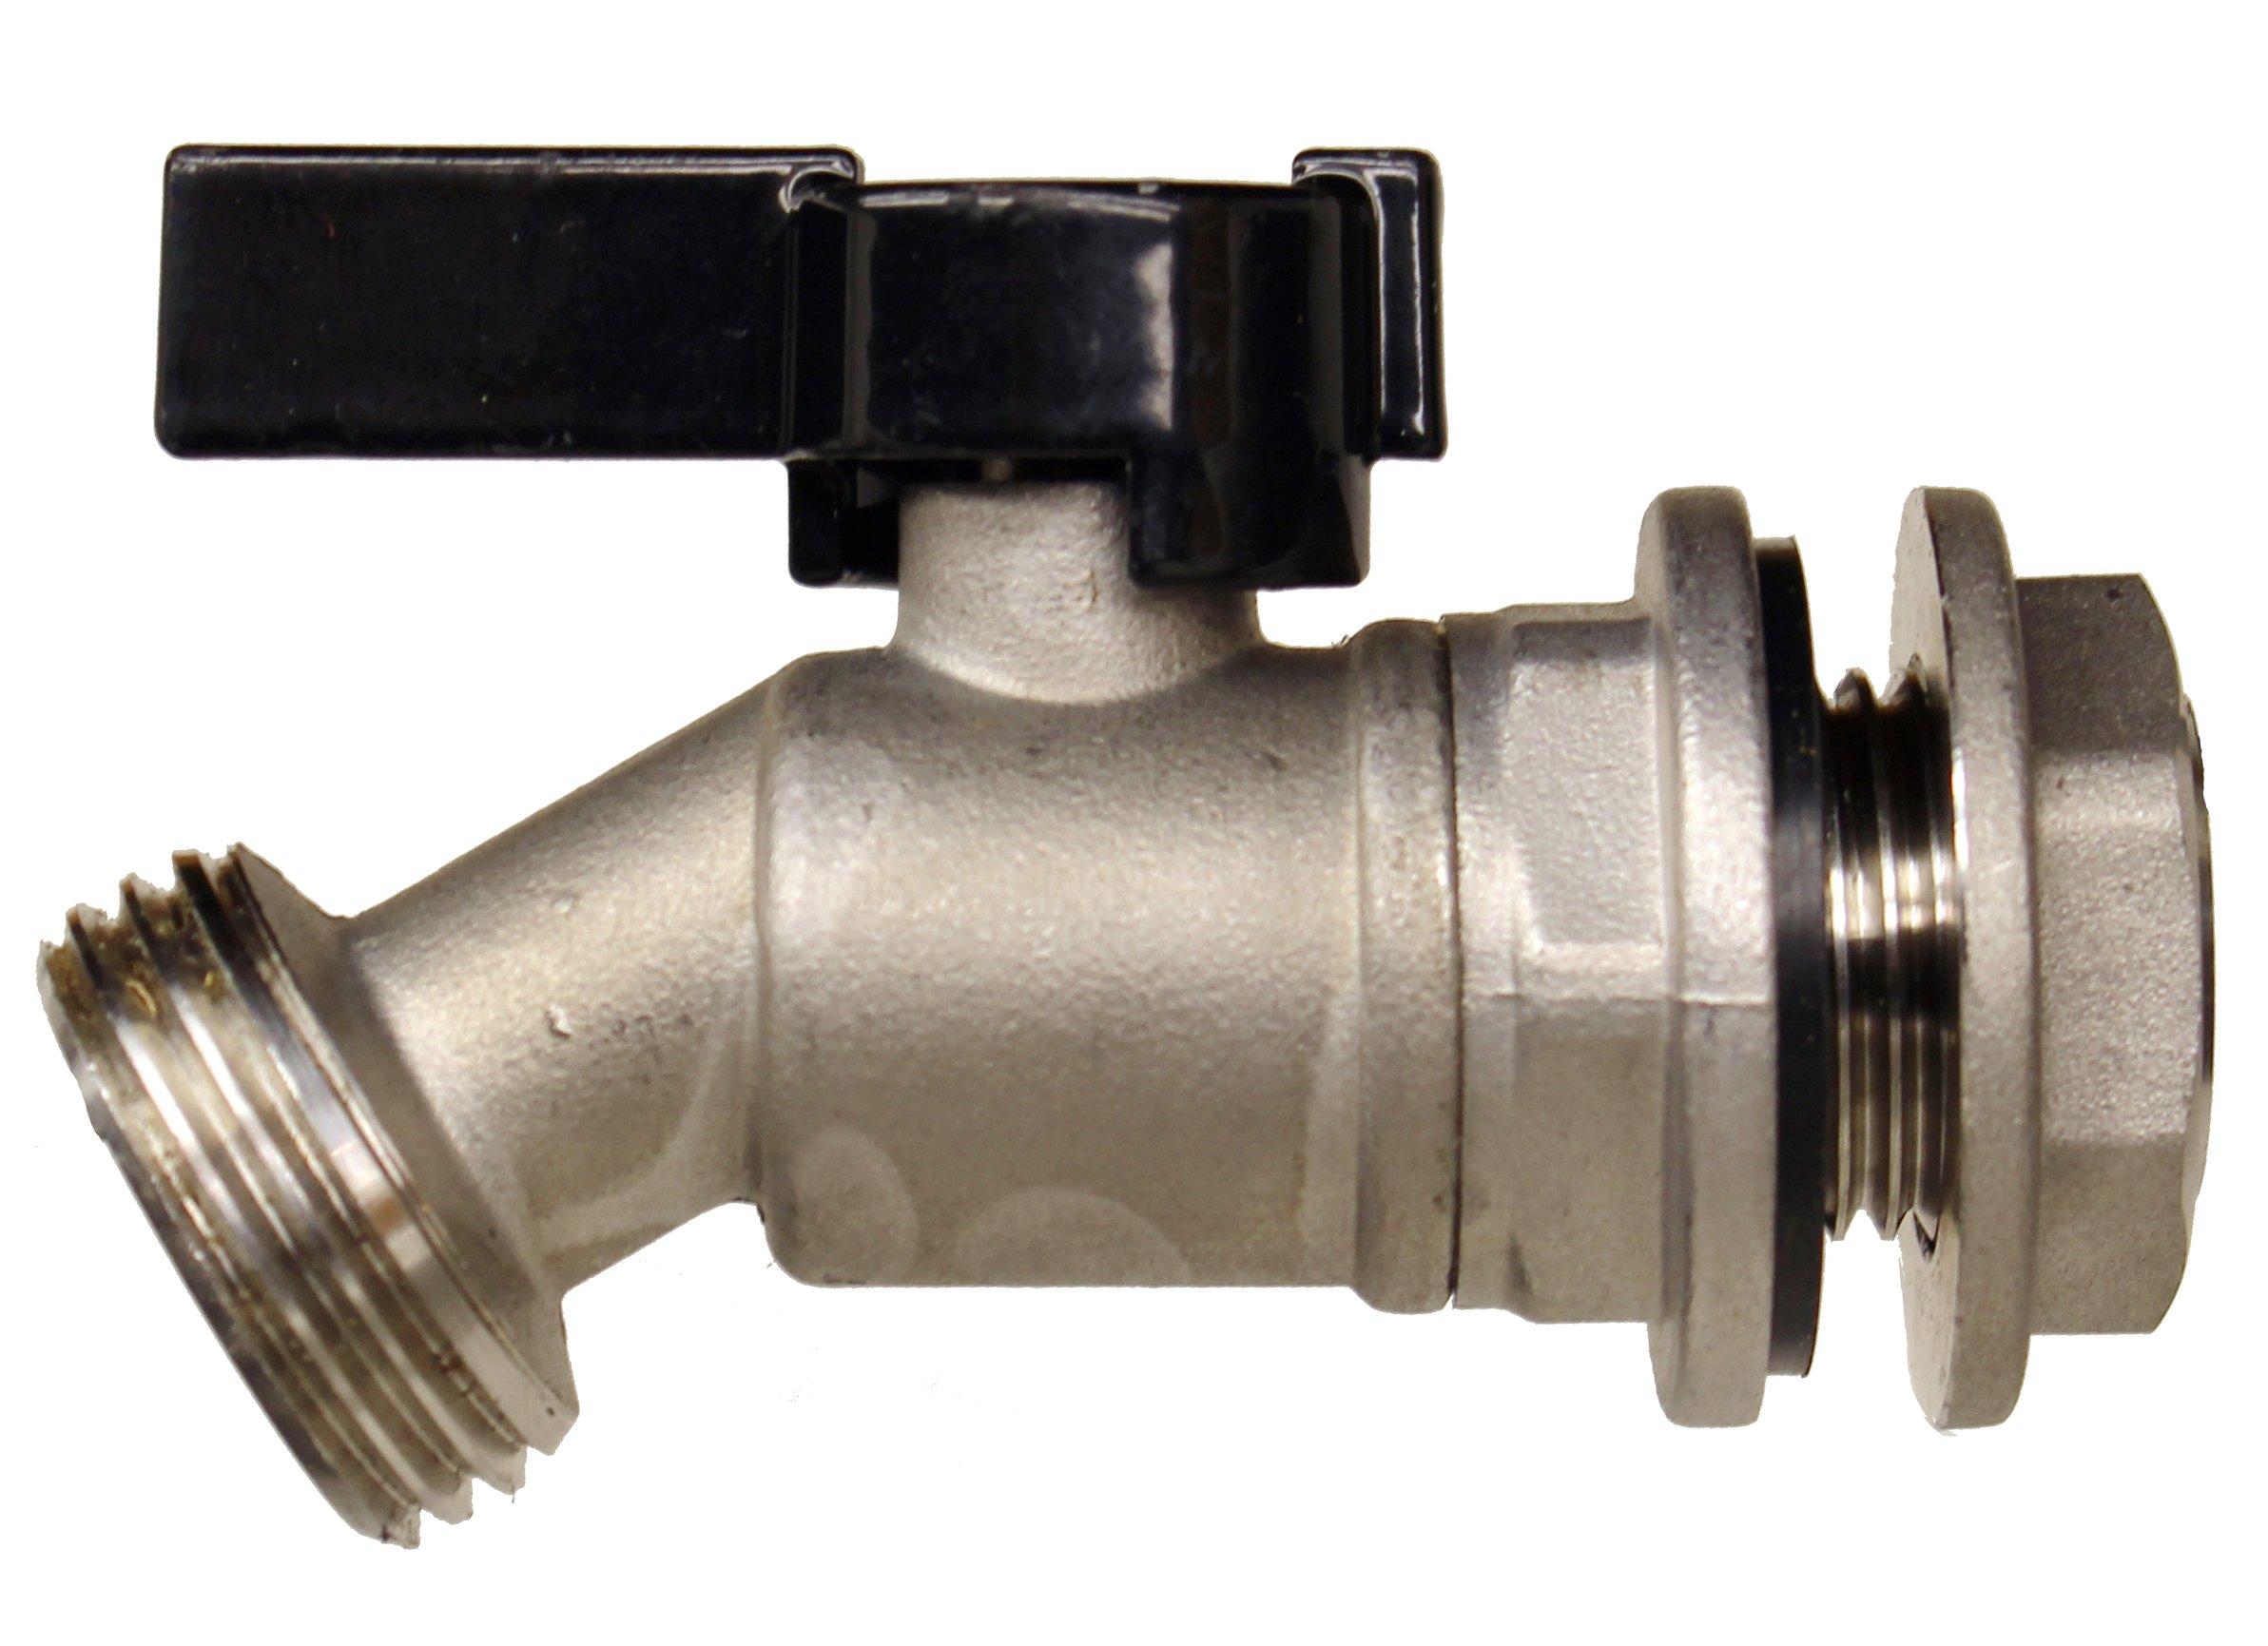 rainpal rbs006 stainless steel rain barrel spigot ball valve quarter turn